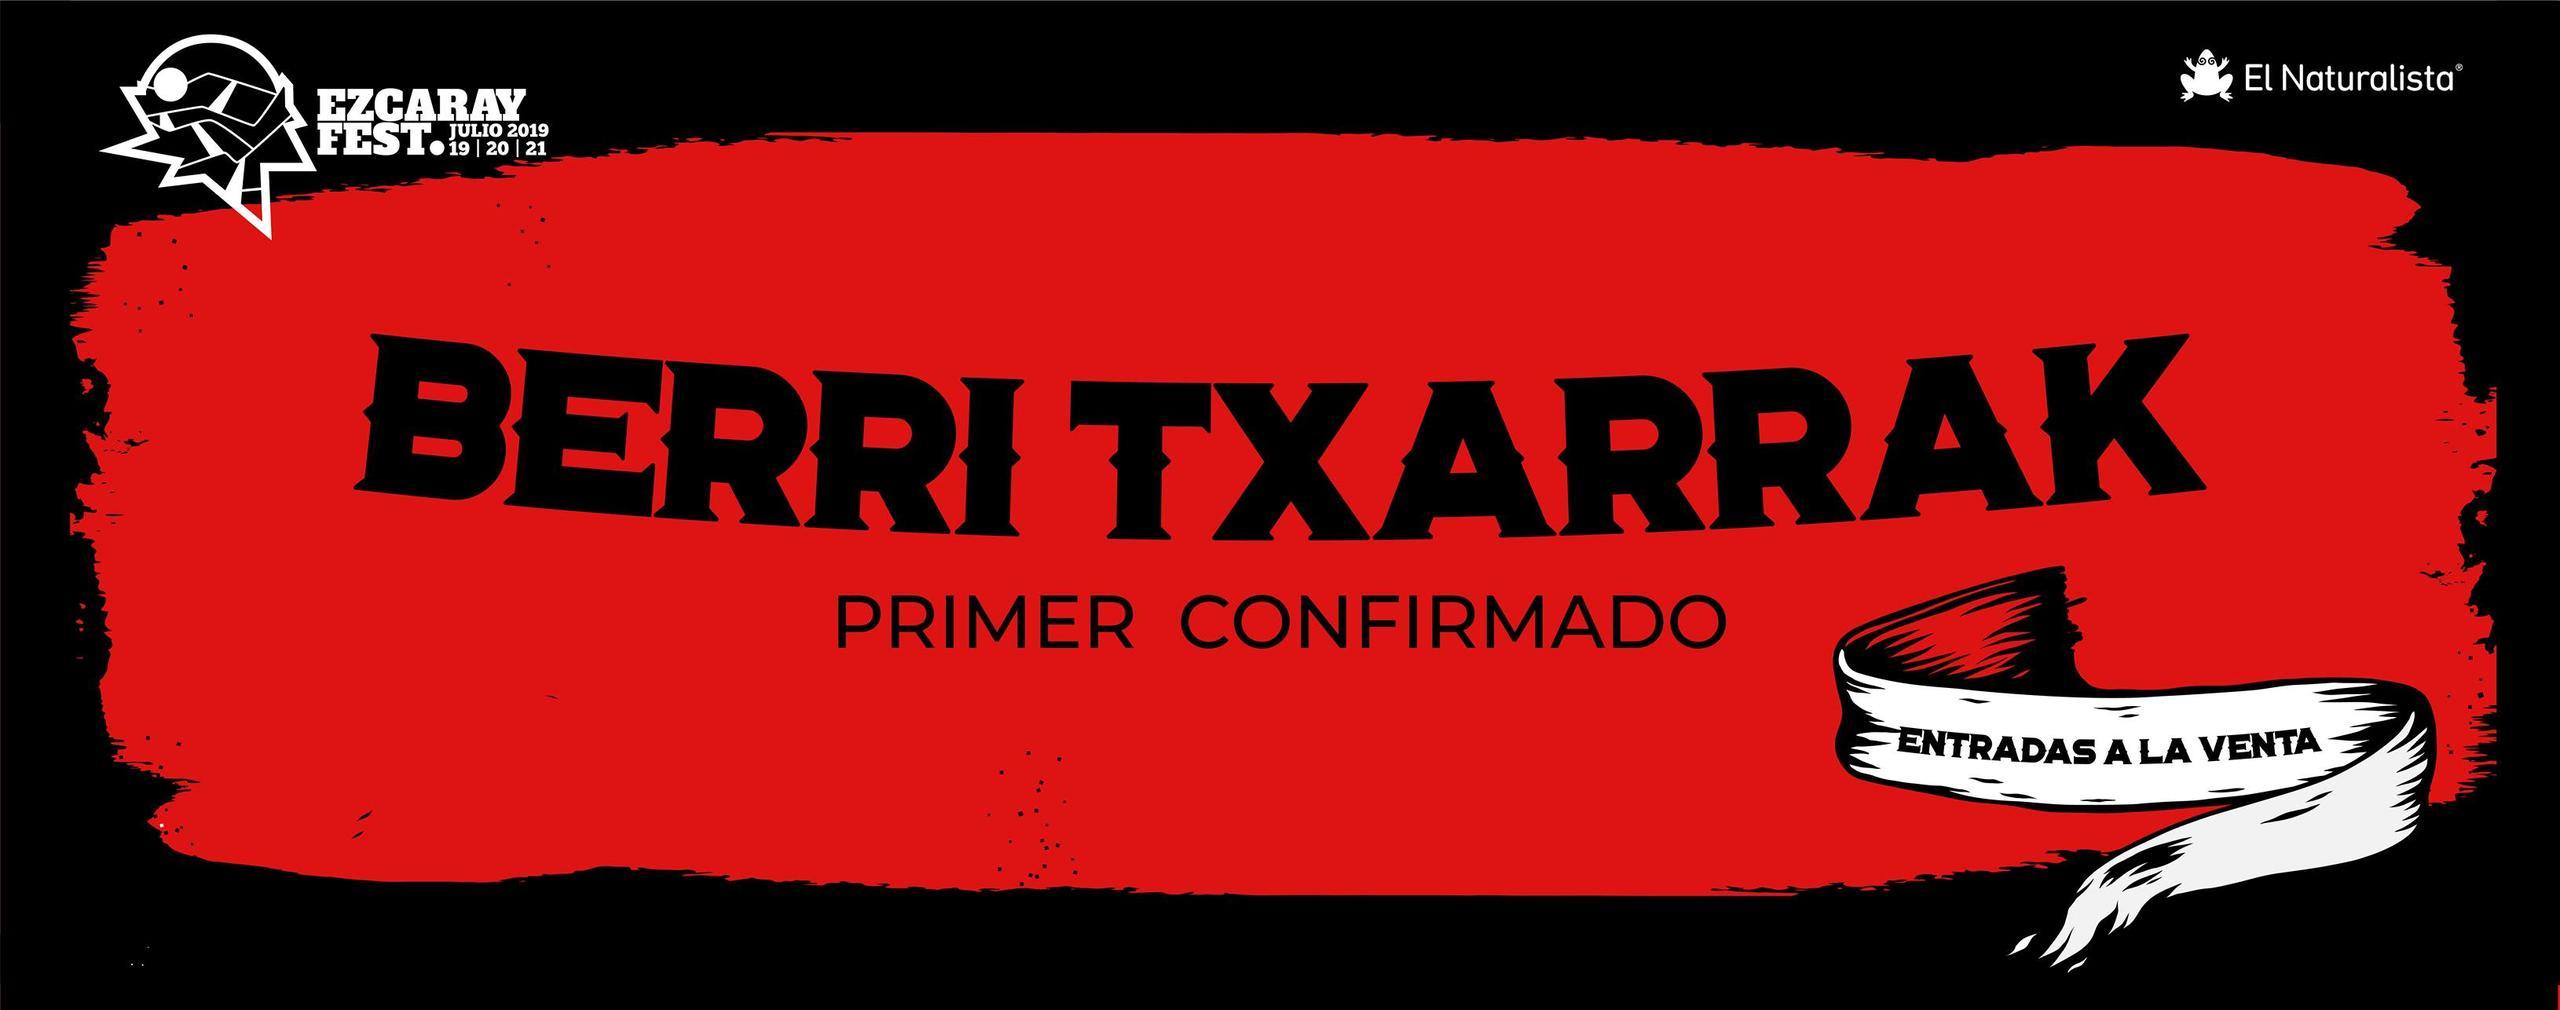 Berri Txarrak, primera confirmación del EzcarayFest